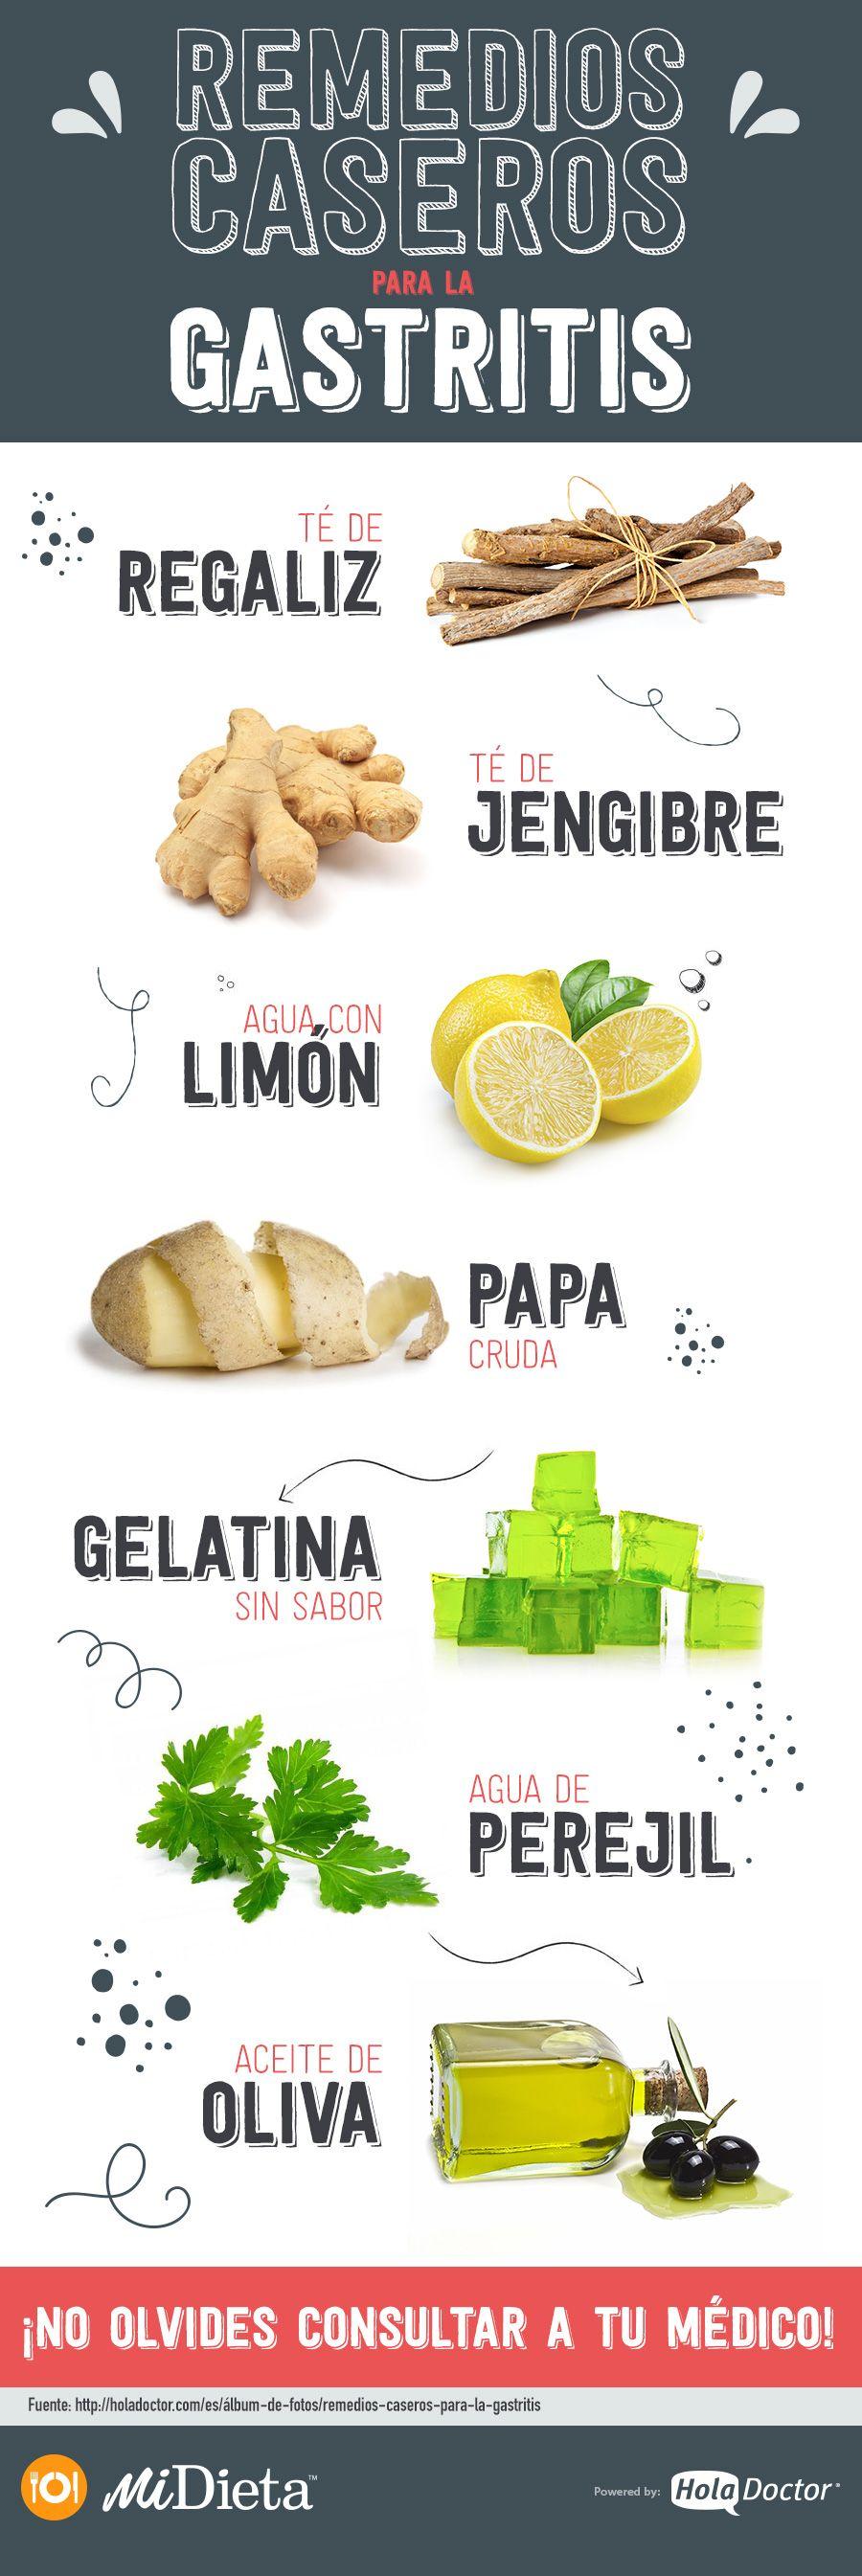 la comida cruda cura la diabetes